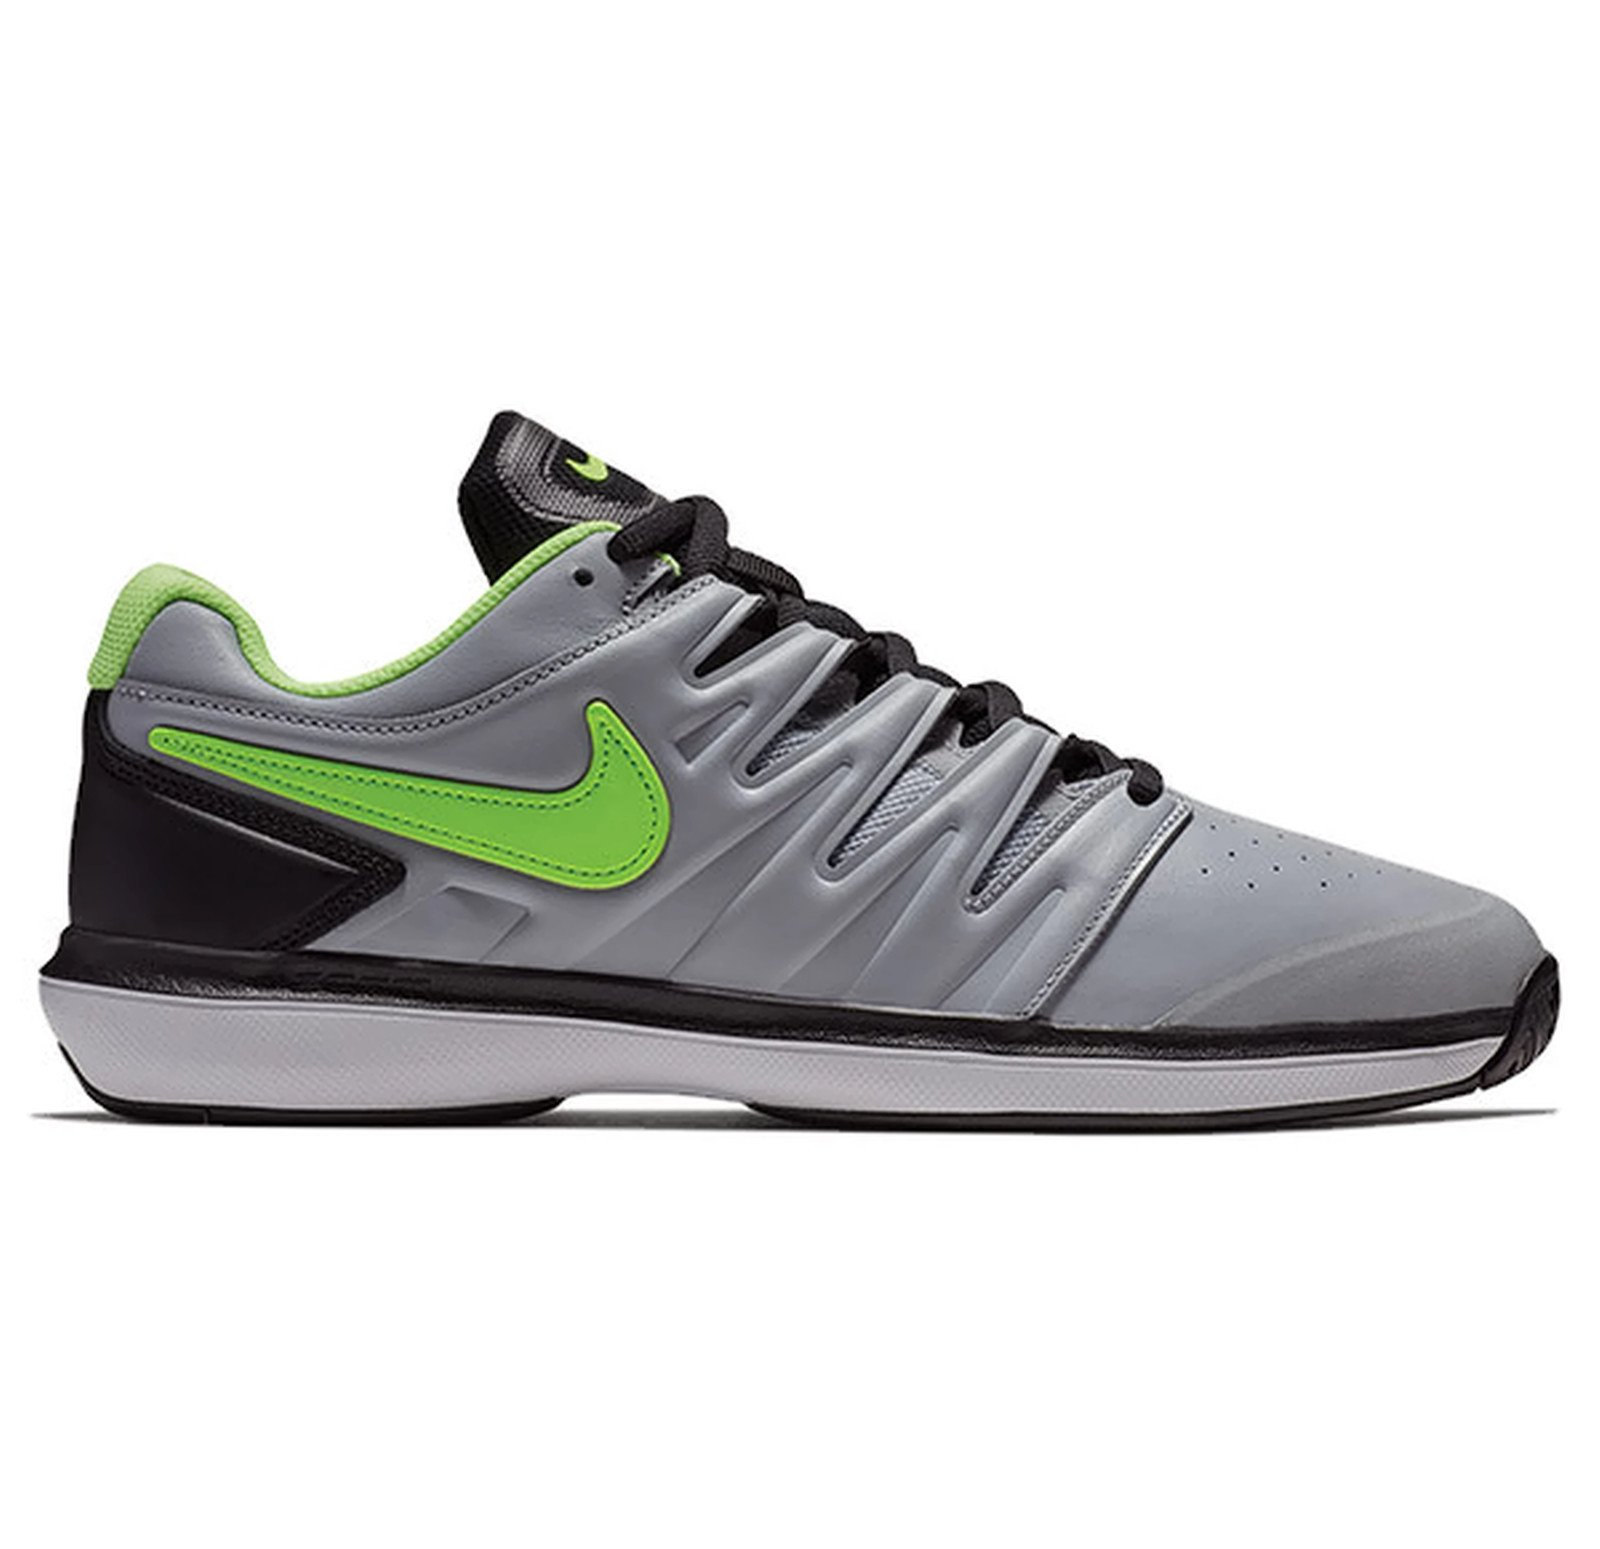 Galleon - Nike Men s Air Zoom Prestige Tennis Shoes (10 D US ... 5eff50c98